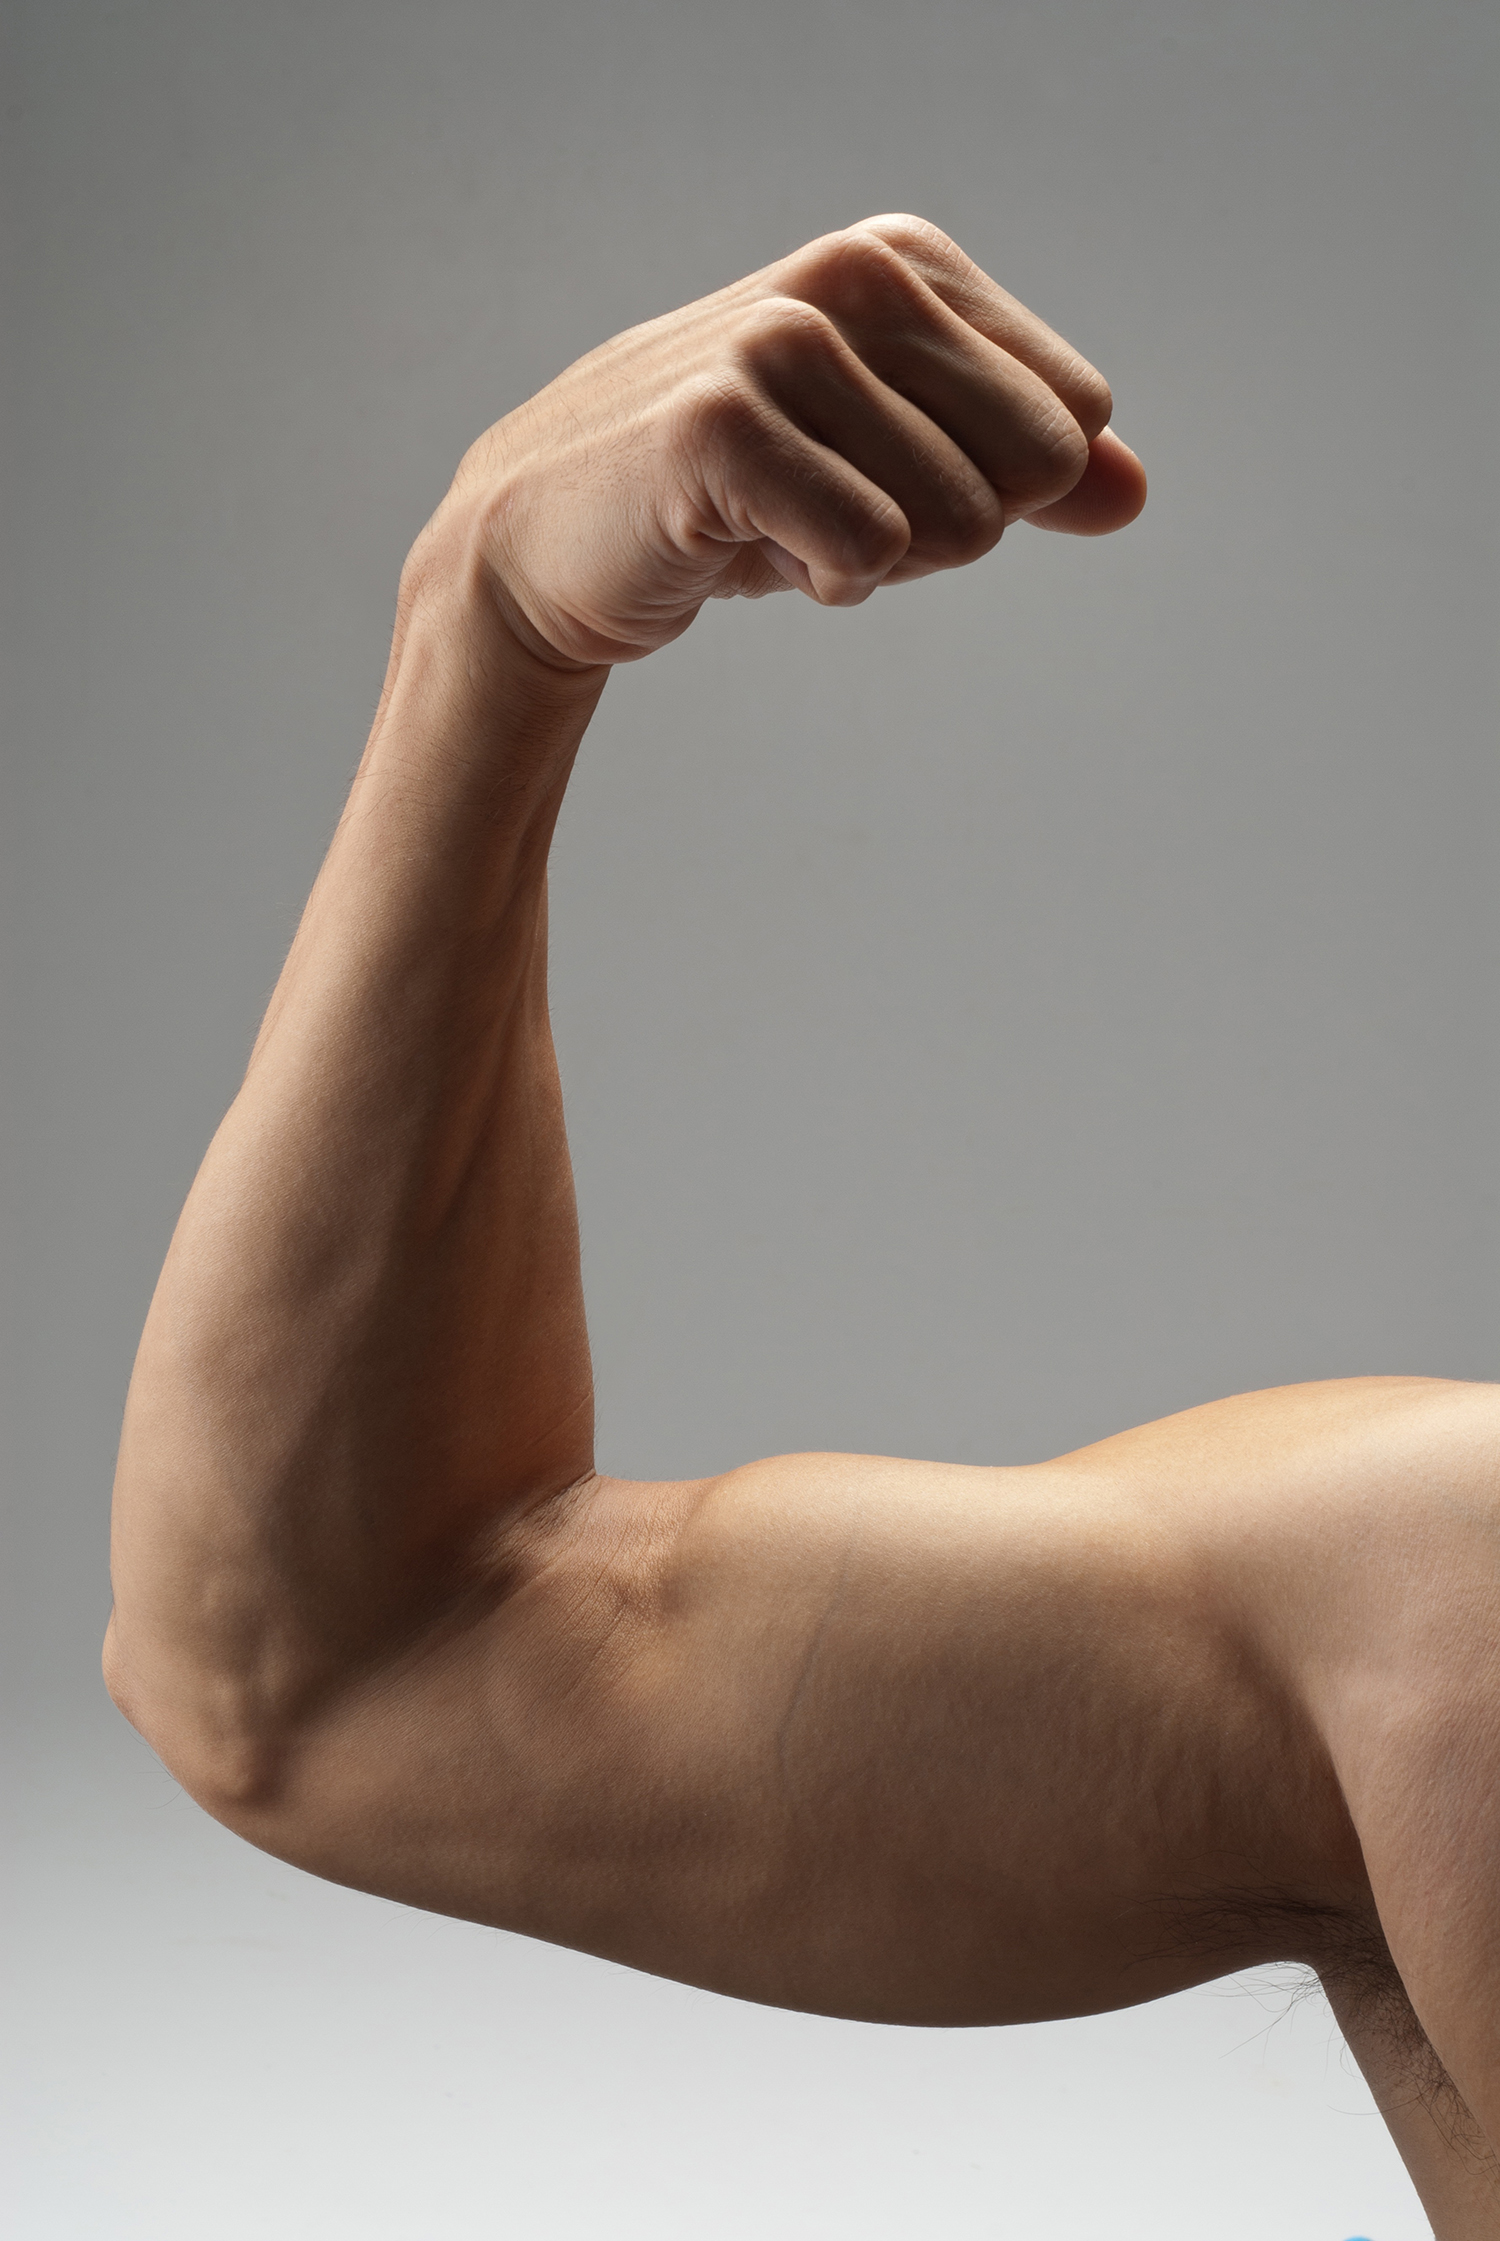 Man Flexing Biceps Muscles